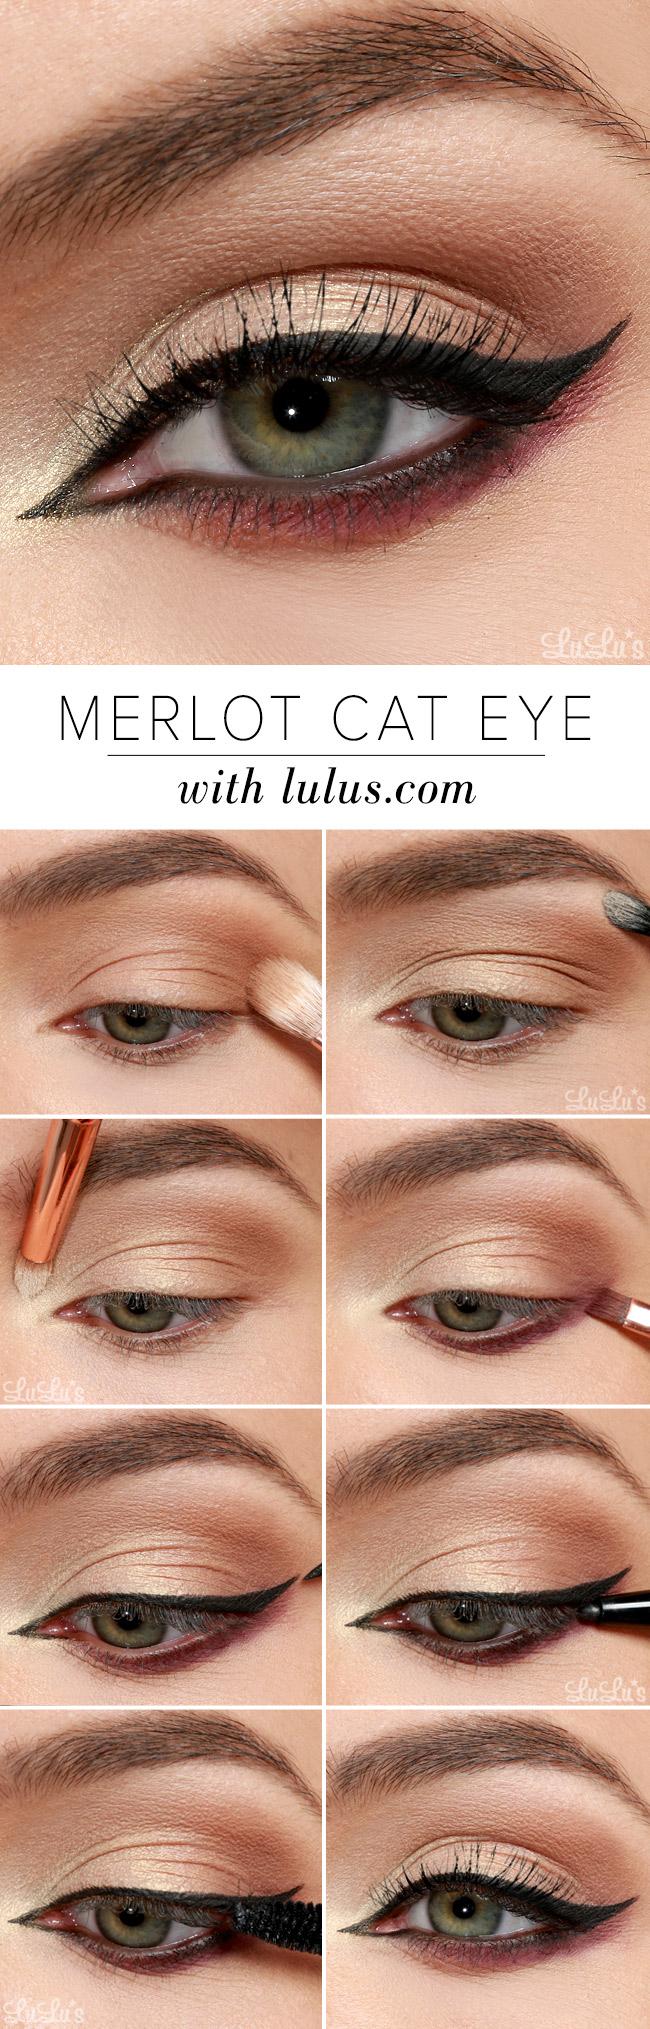 merlot-cat-eye-